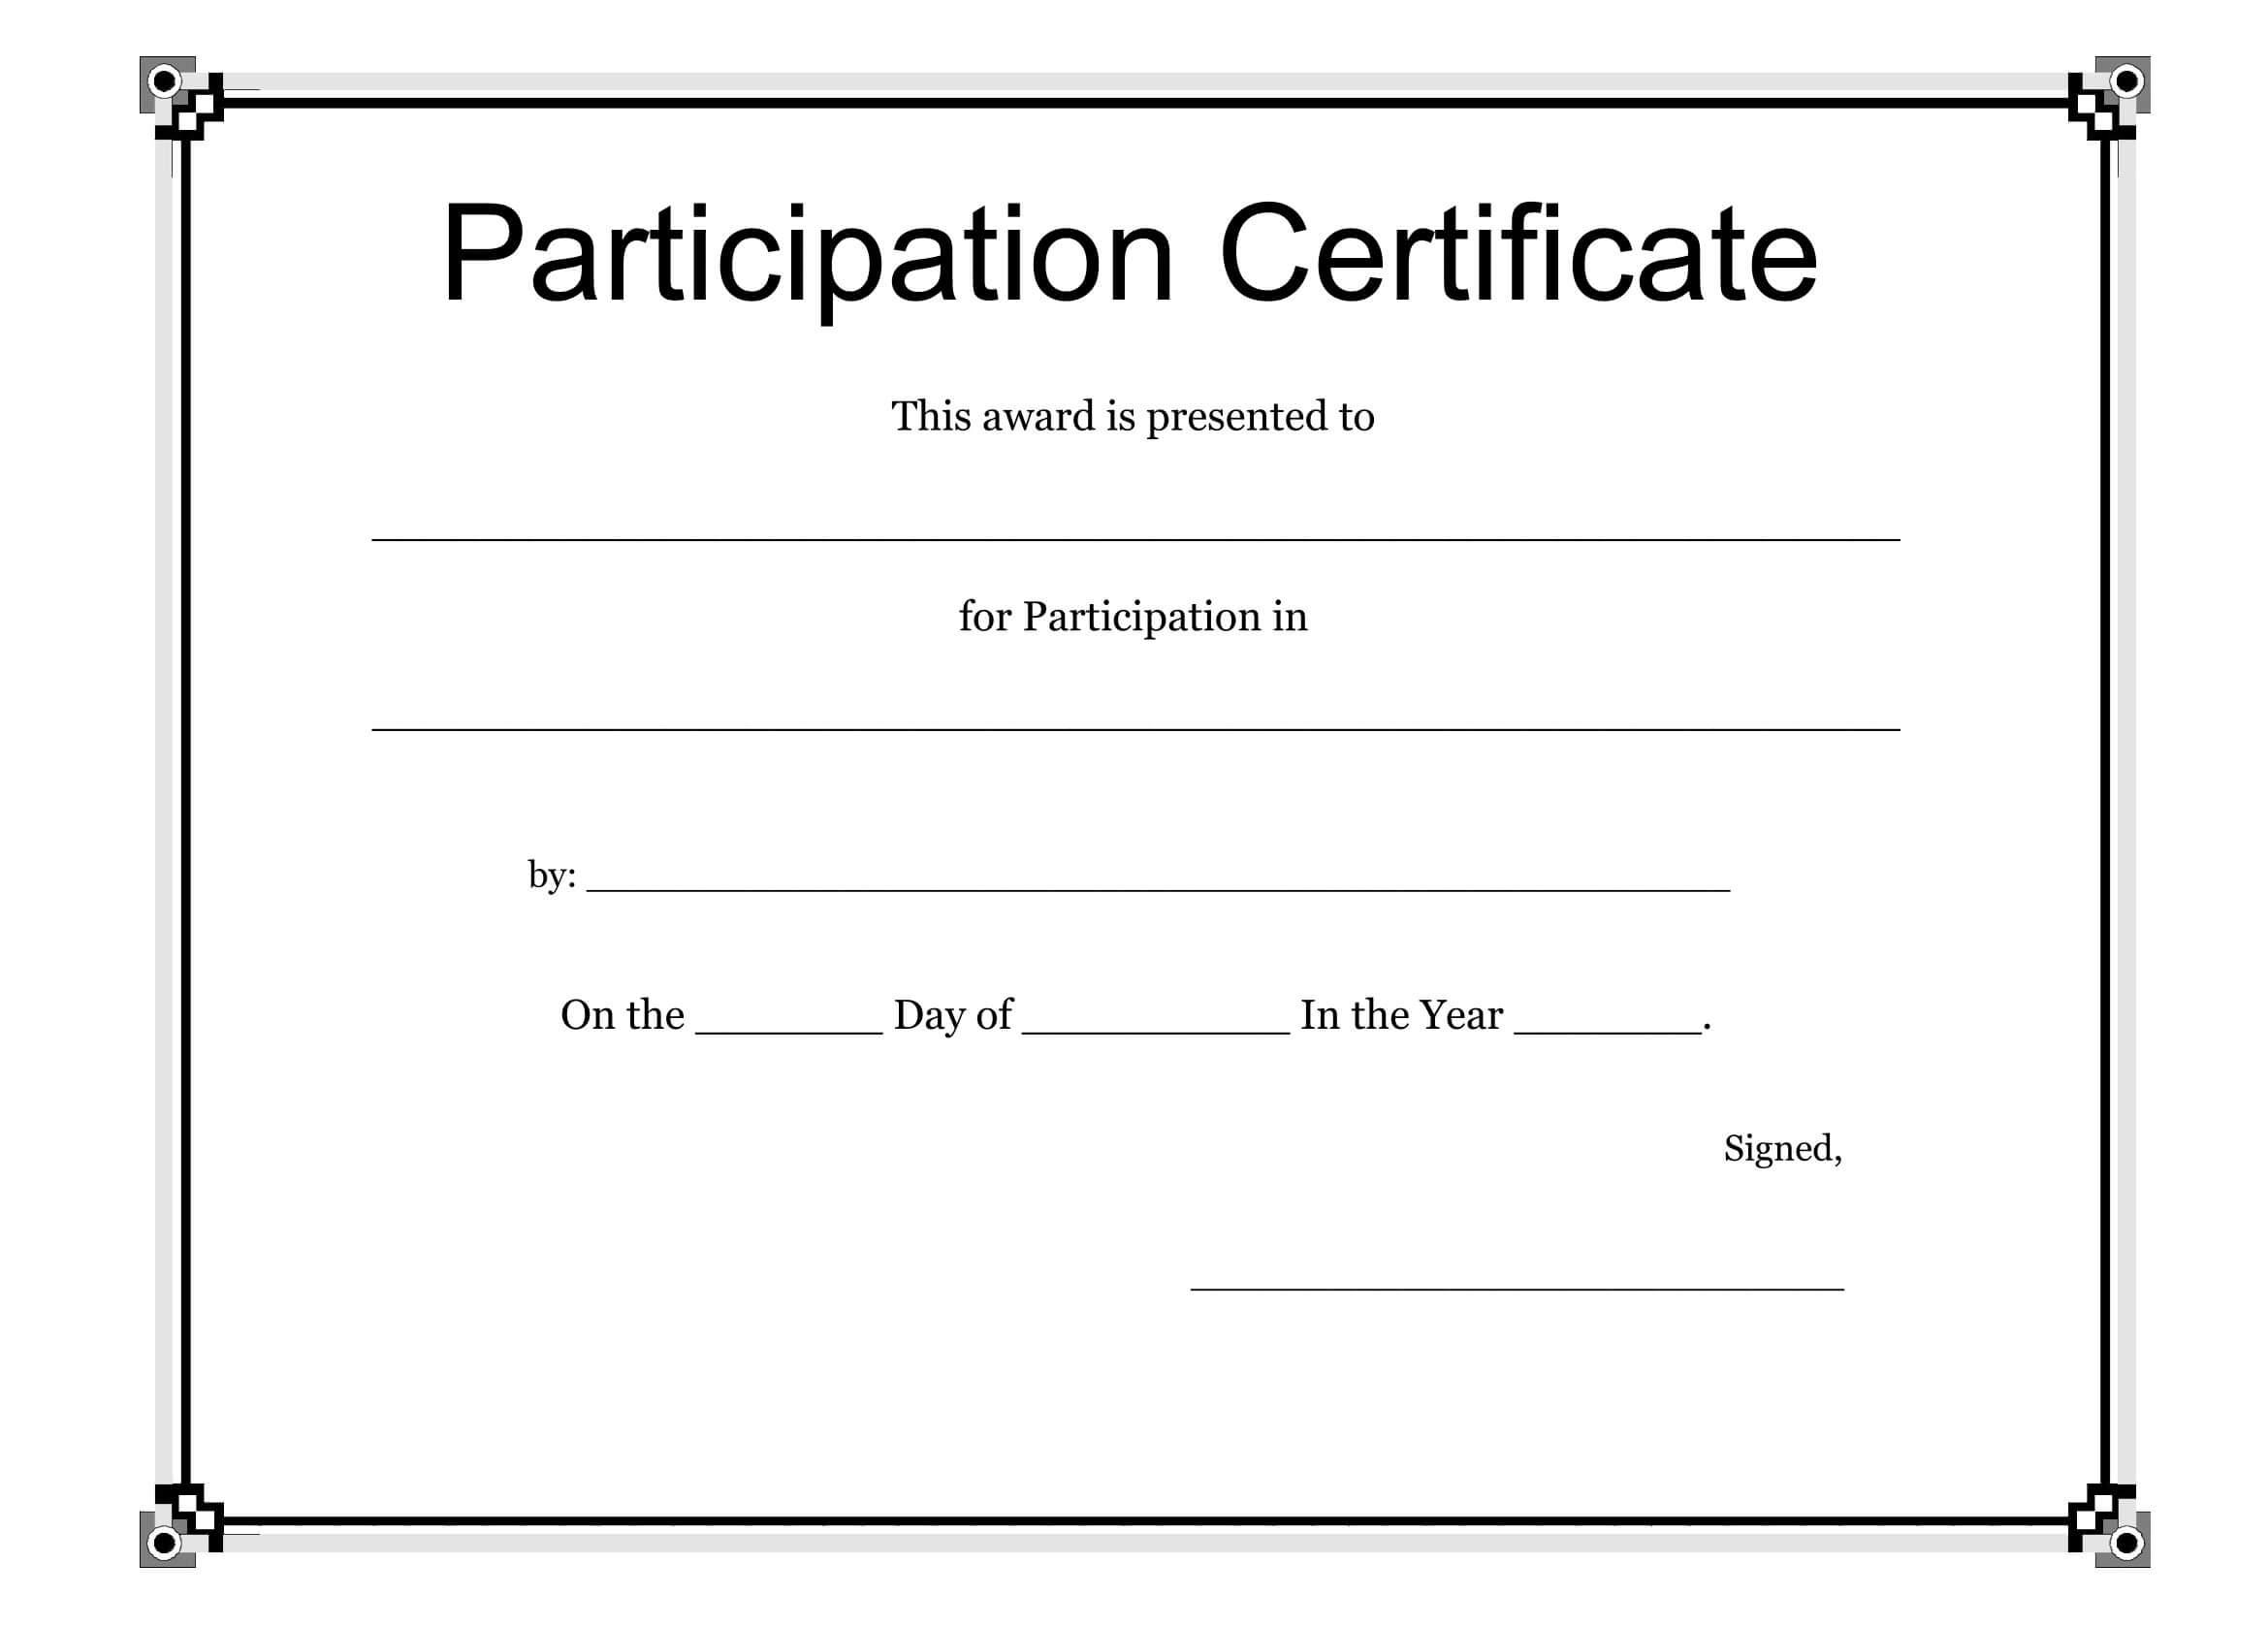 certificate of ownership sample - Ficim Inside Award Certificate Templates Word 2007